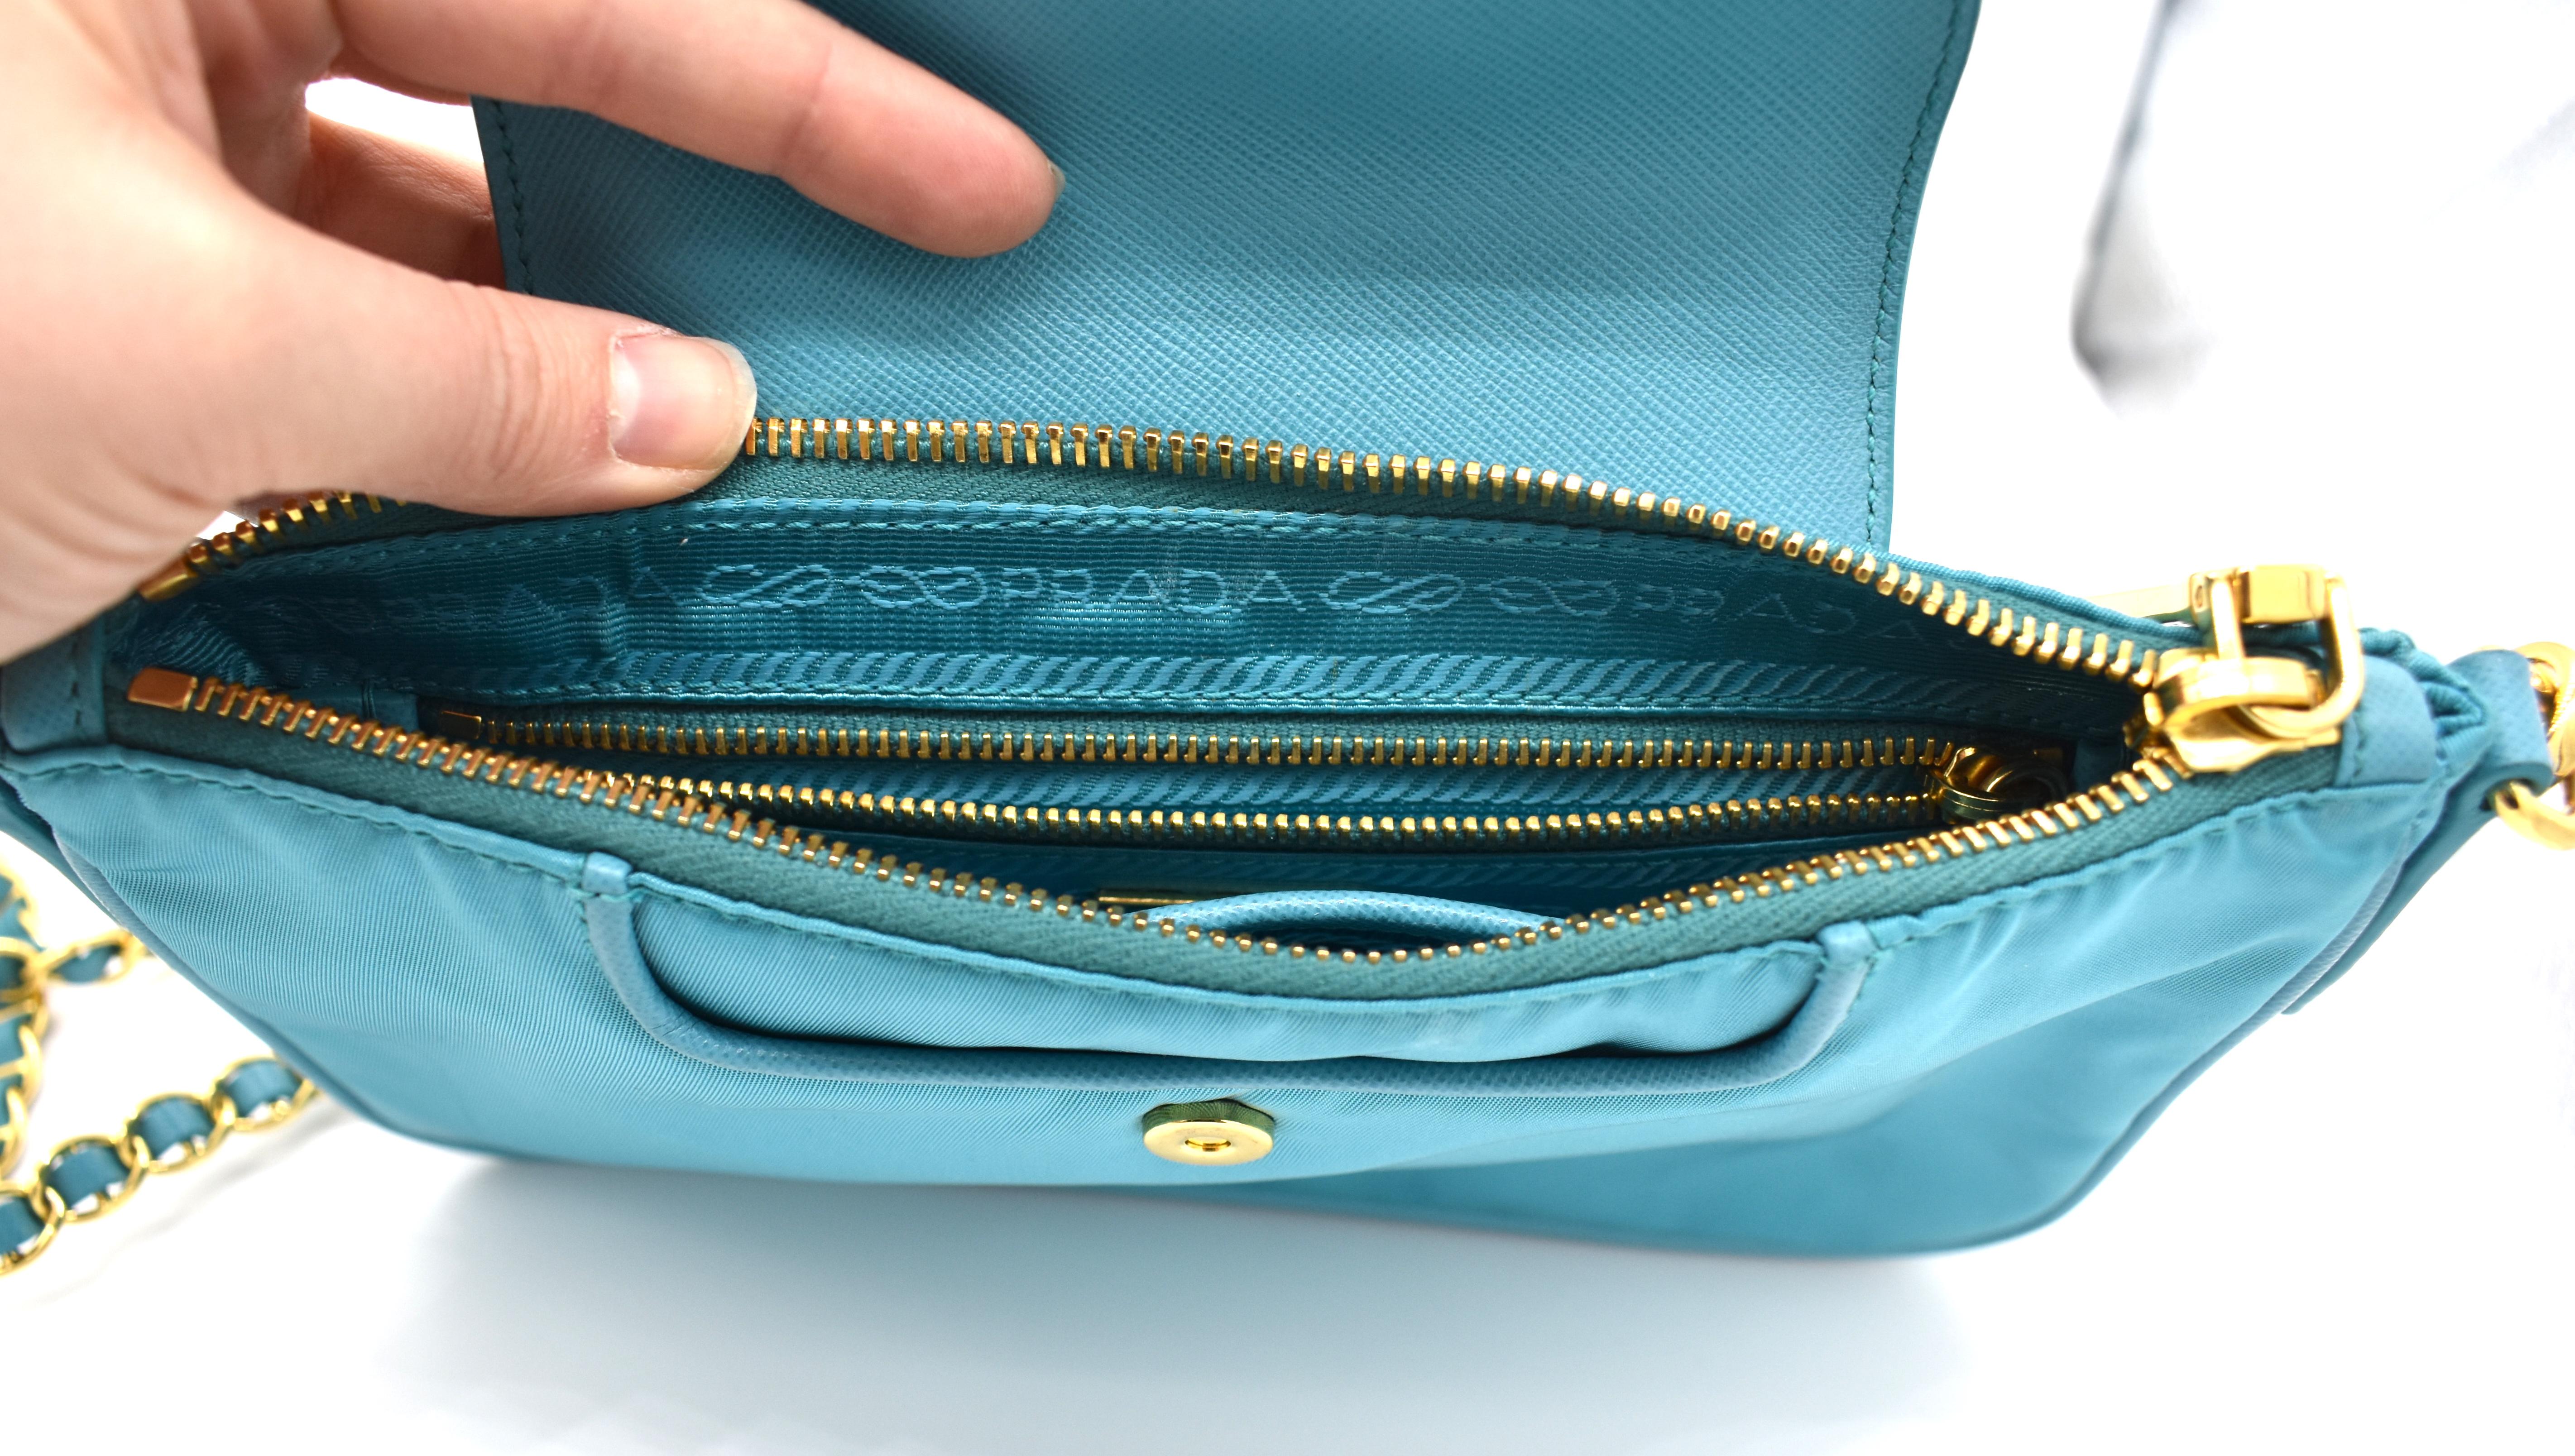 e3379f2c4f83 Prada Nylon Mini Shoulder Bag – DesignerShare